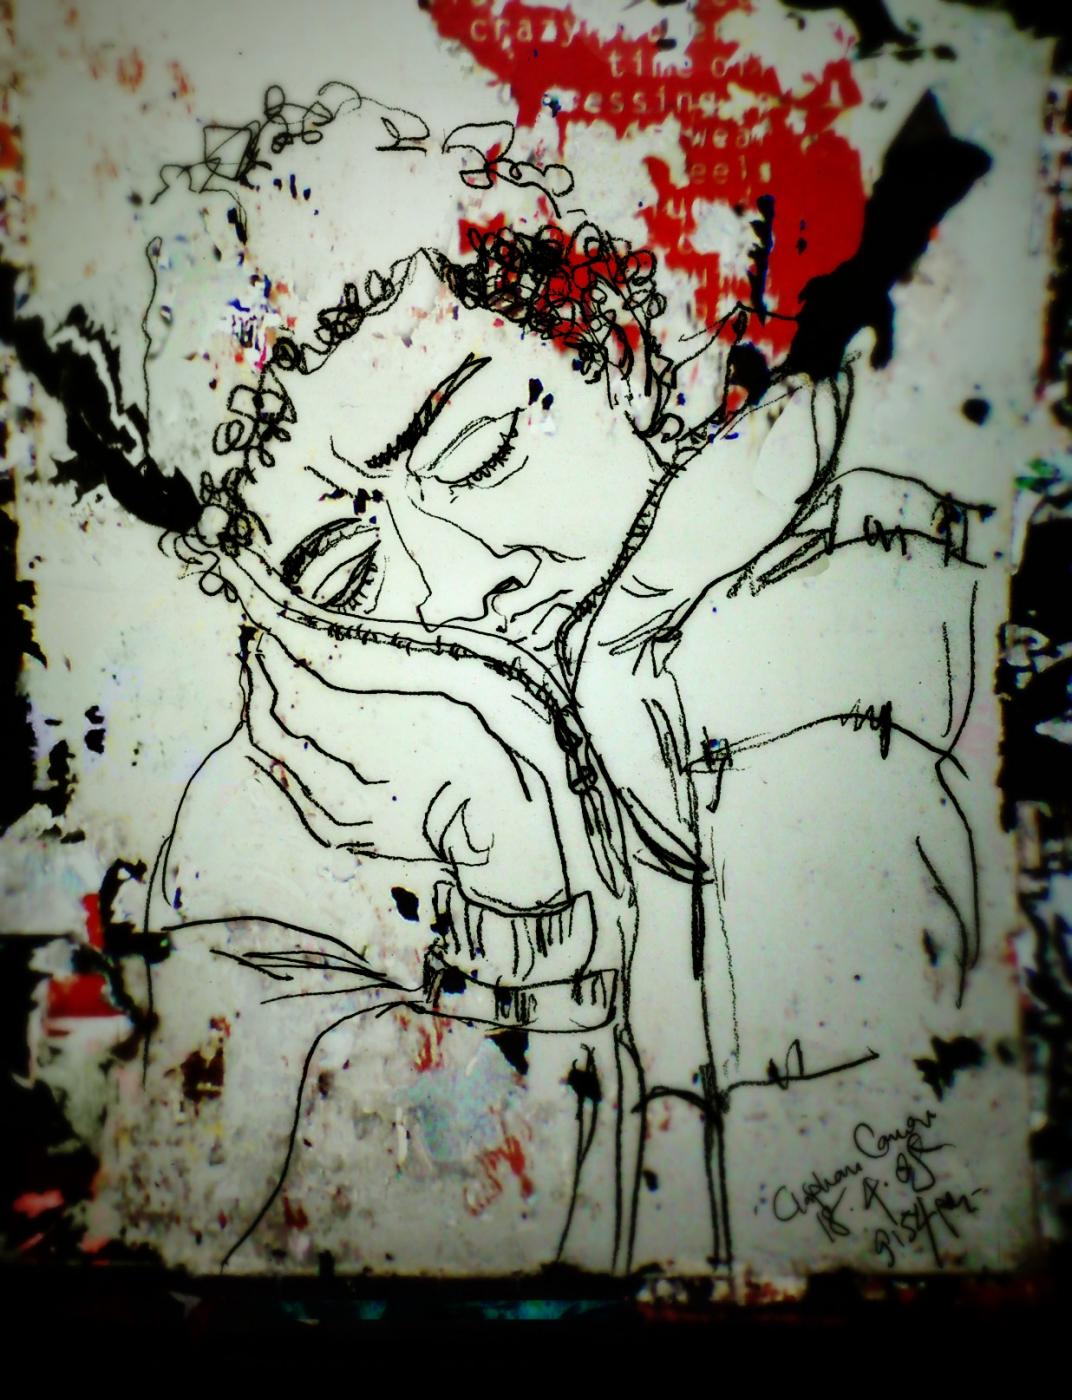 7302603-Asleep_7f_m w1f